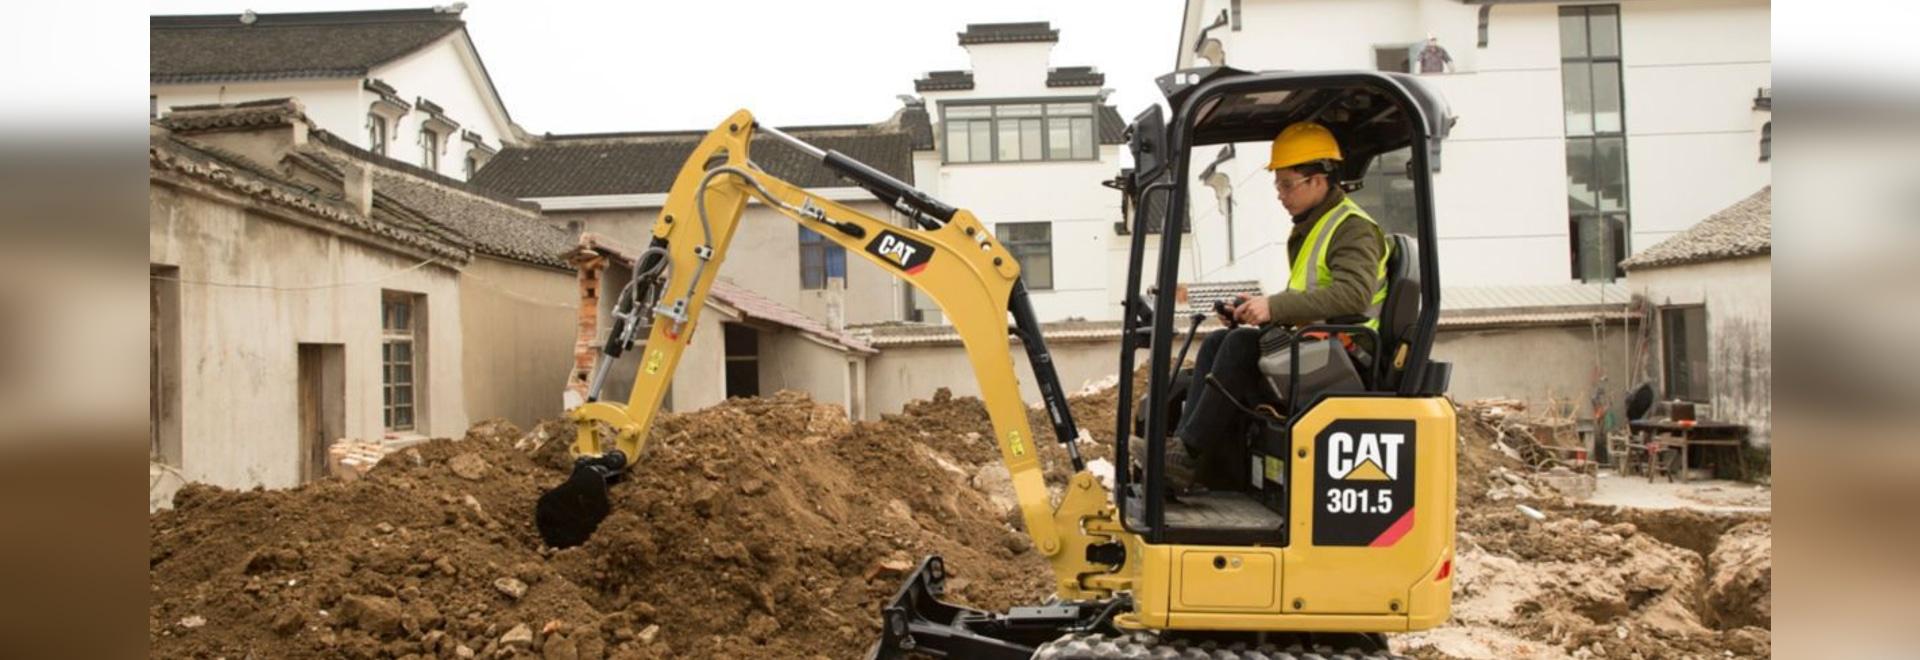 Caterpillar Next Generation 1- to 2-ton Excavators